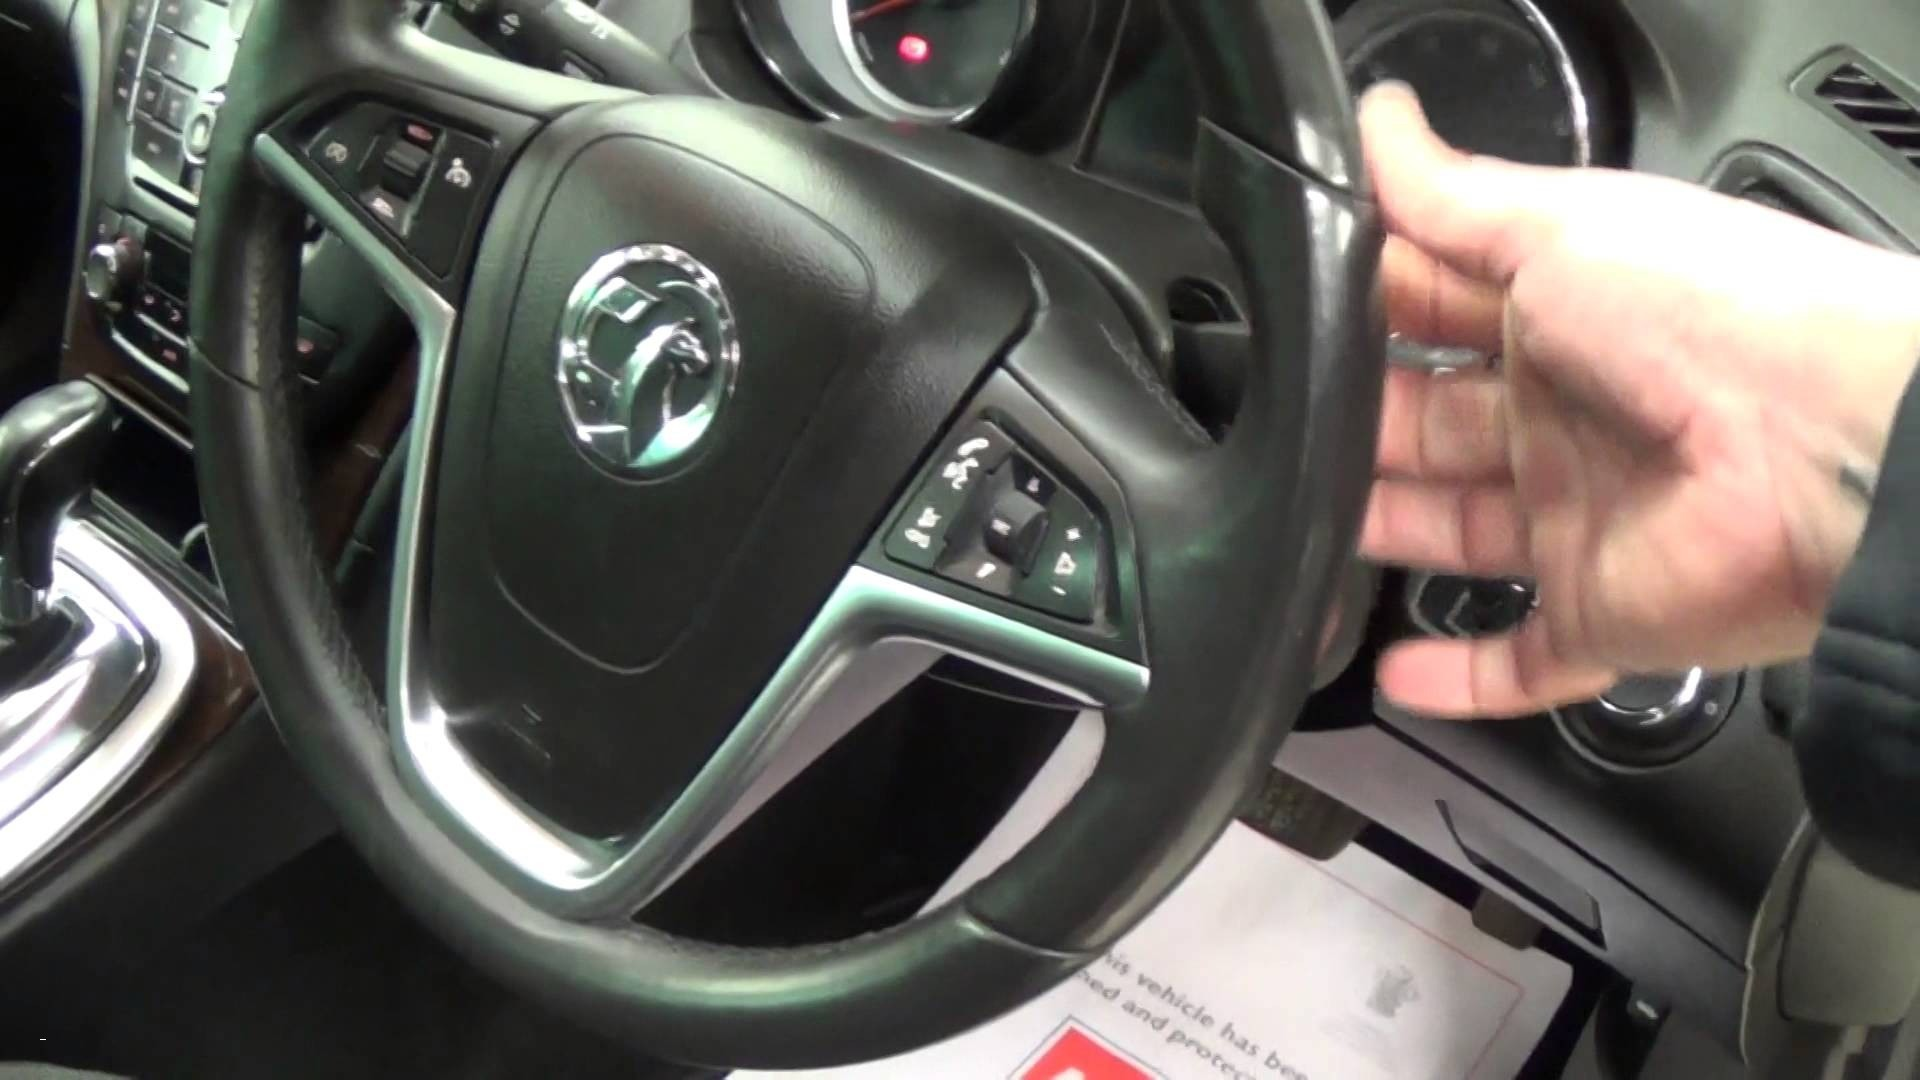 Auto Part Diagram Automotive Car Wiring Diagram Save Car Diagram Best Car Parts and Of Auto Part Diagram